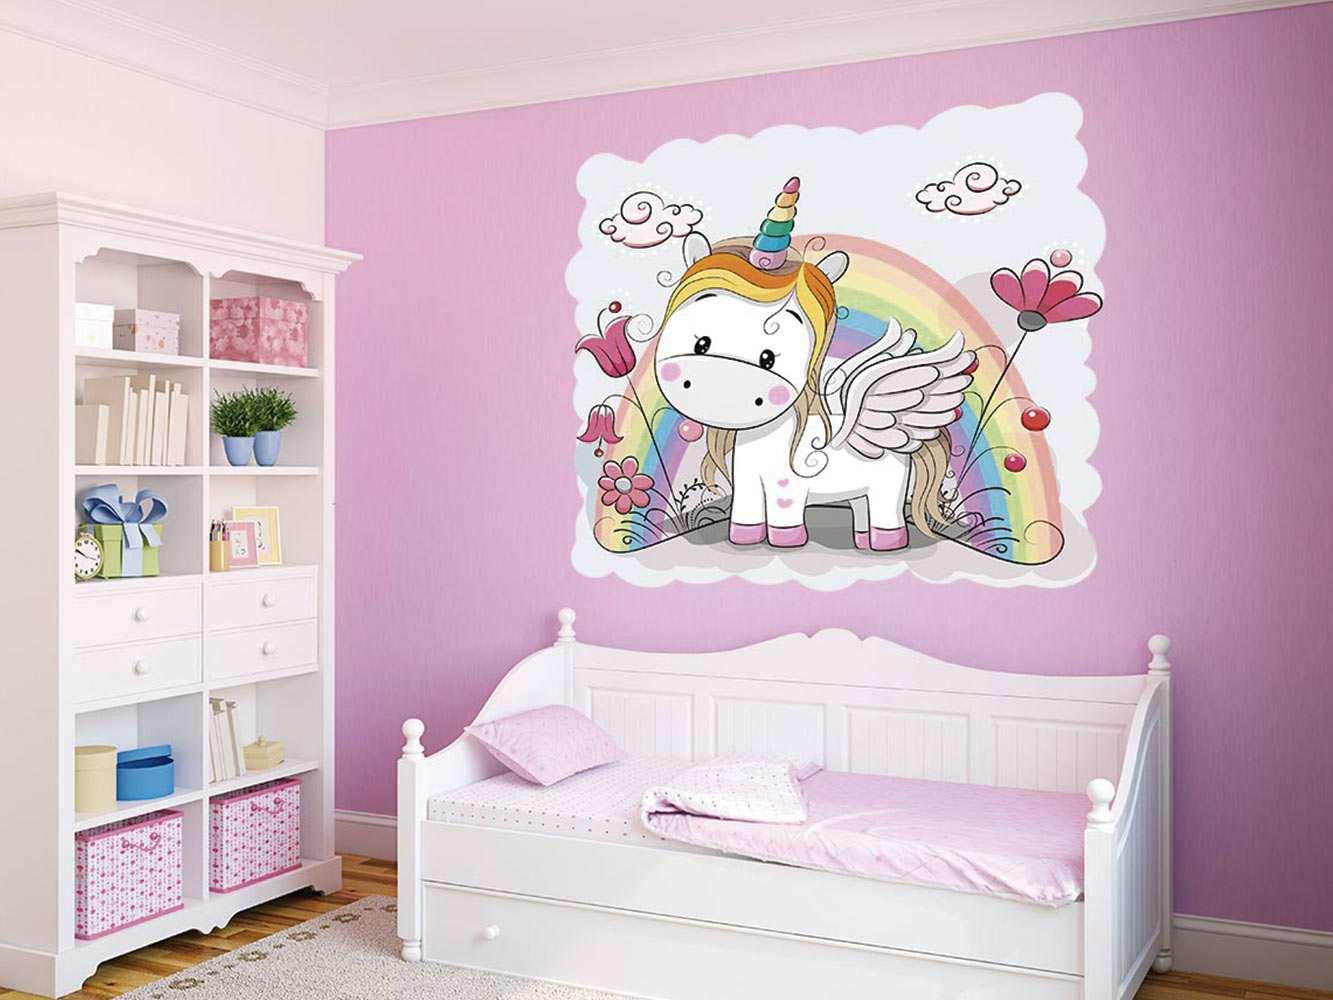 Vinilo Infantil Unicornio Arcoiris | Carteles XXL - Impresión carteleria publicitaria